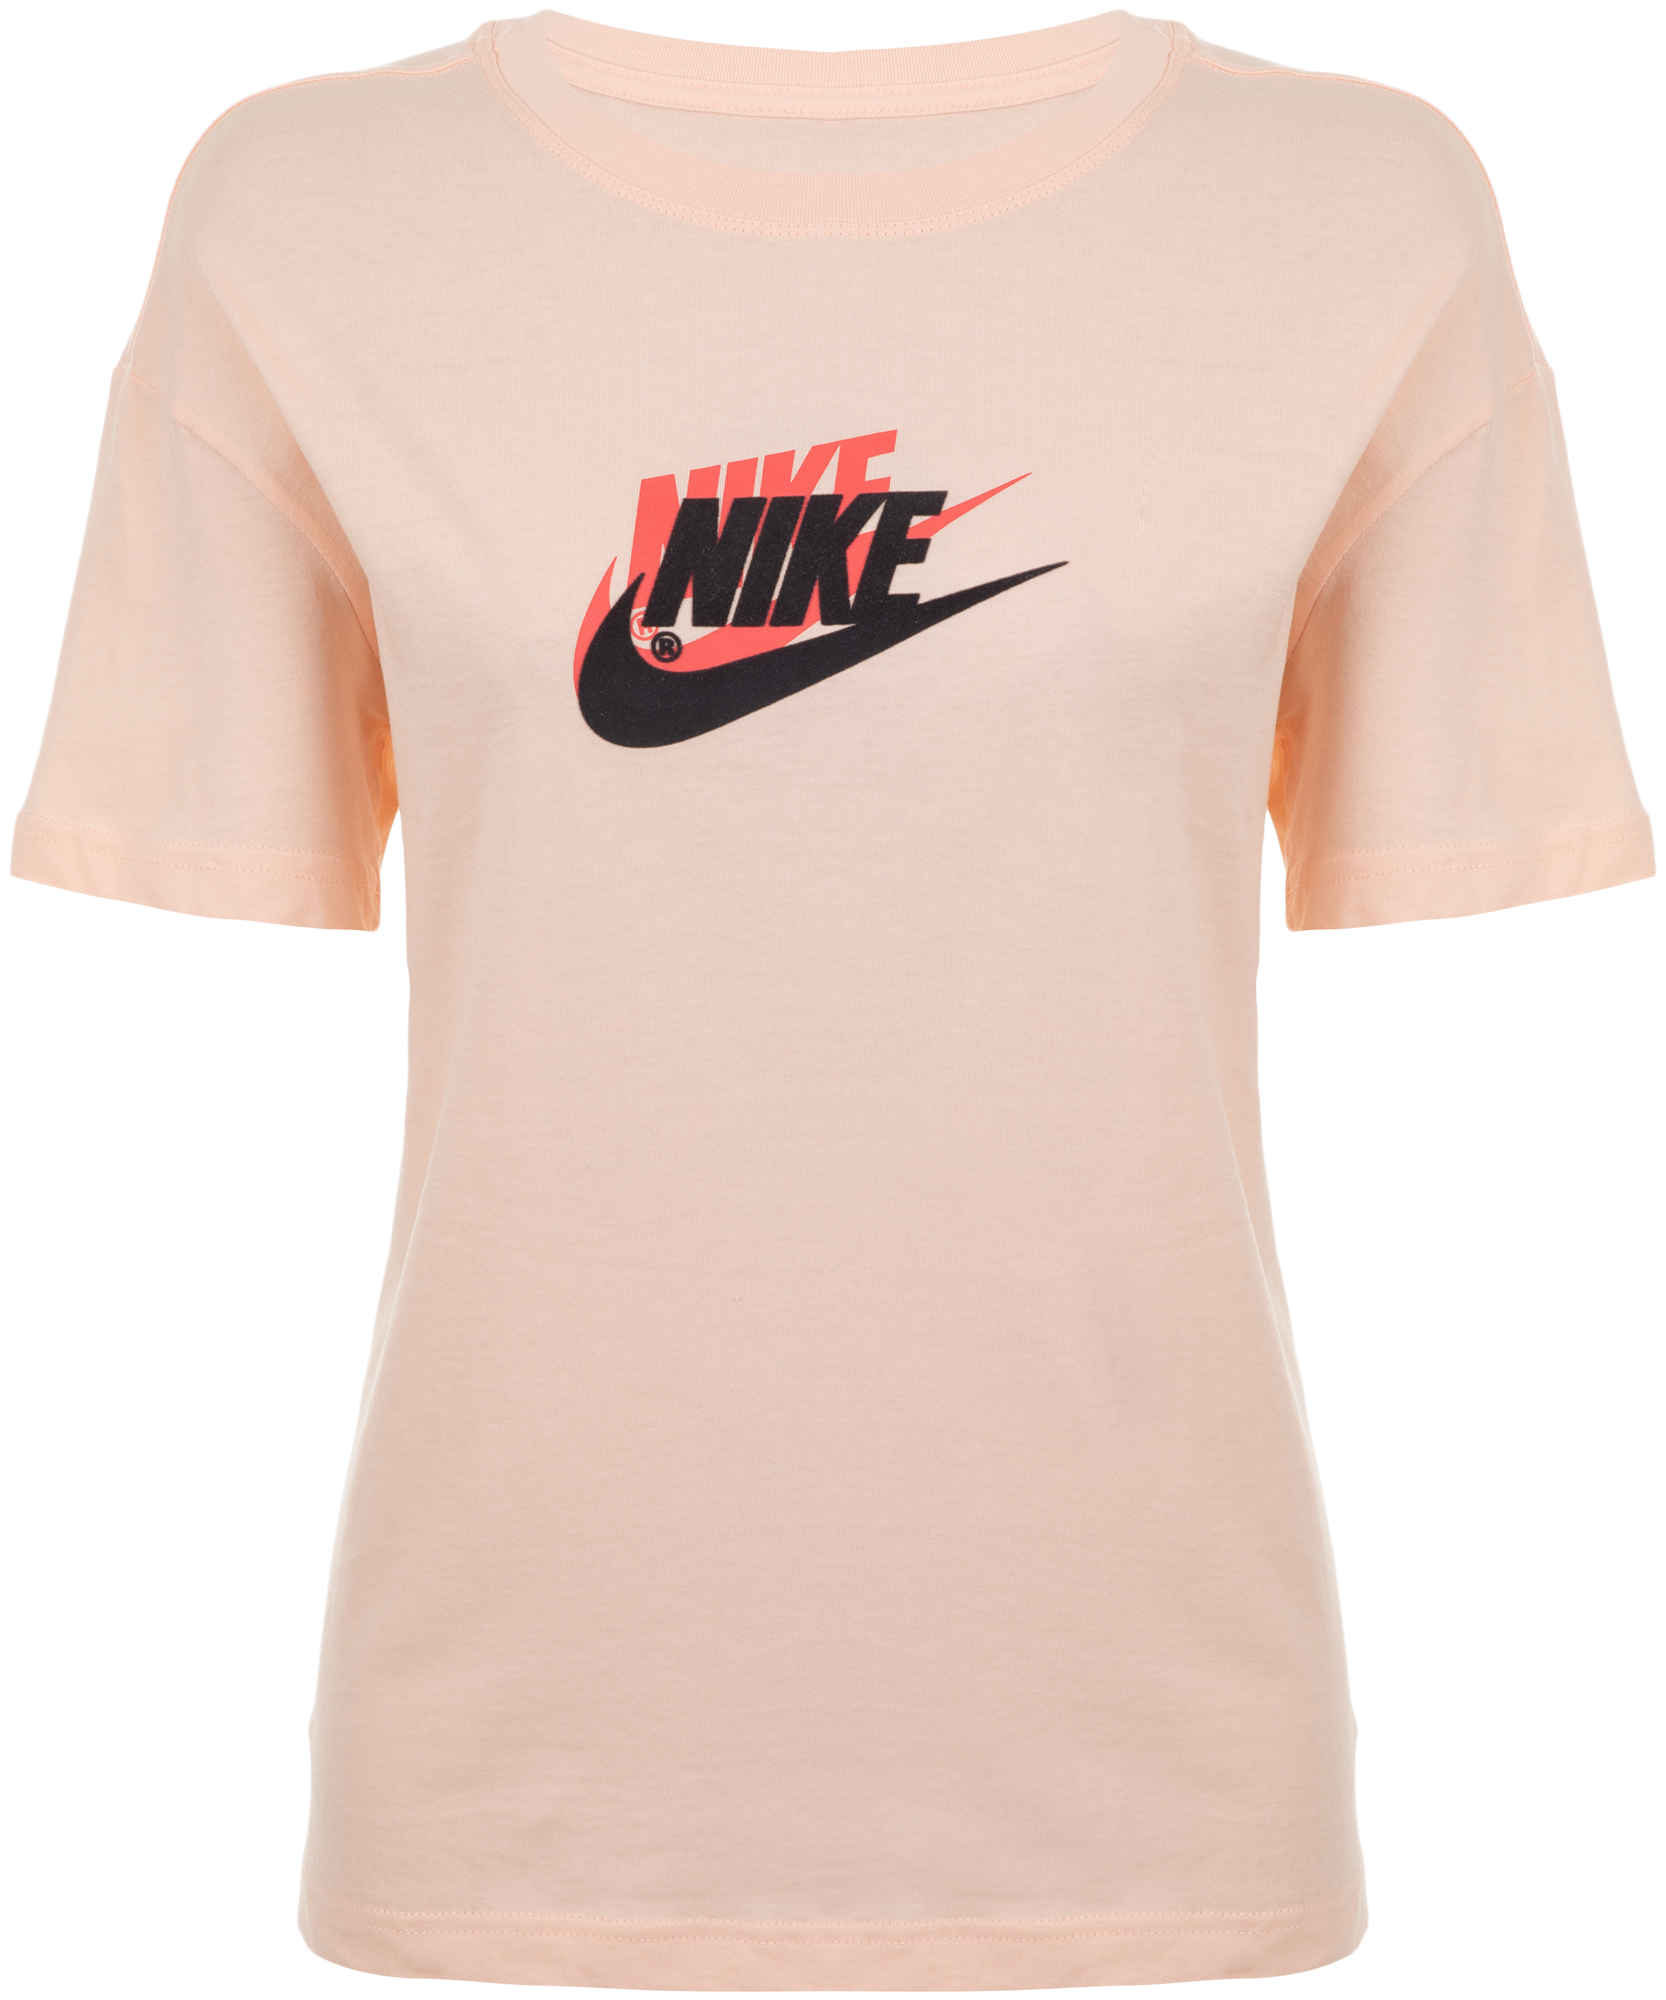 Nike Футболка женская Nike Sportswear, размер 48-50 цена